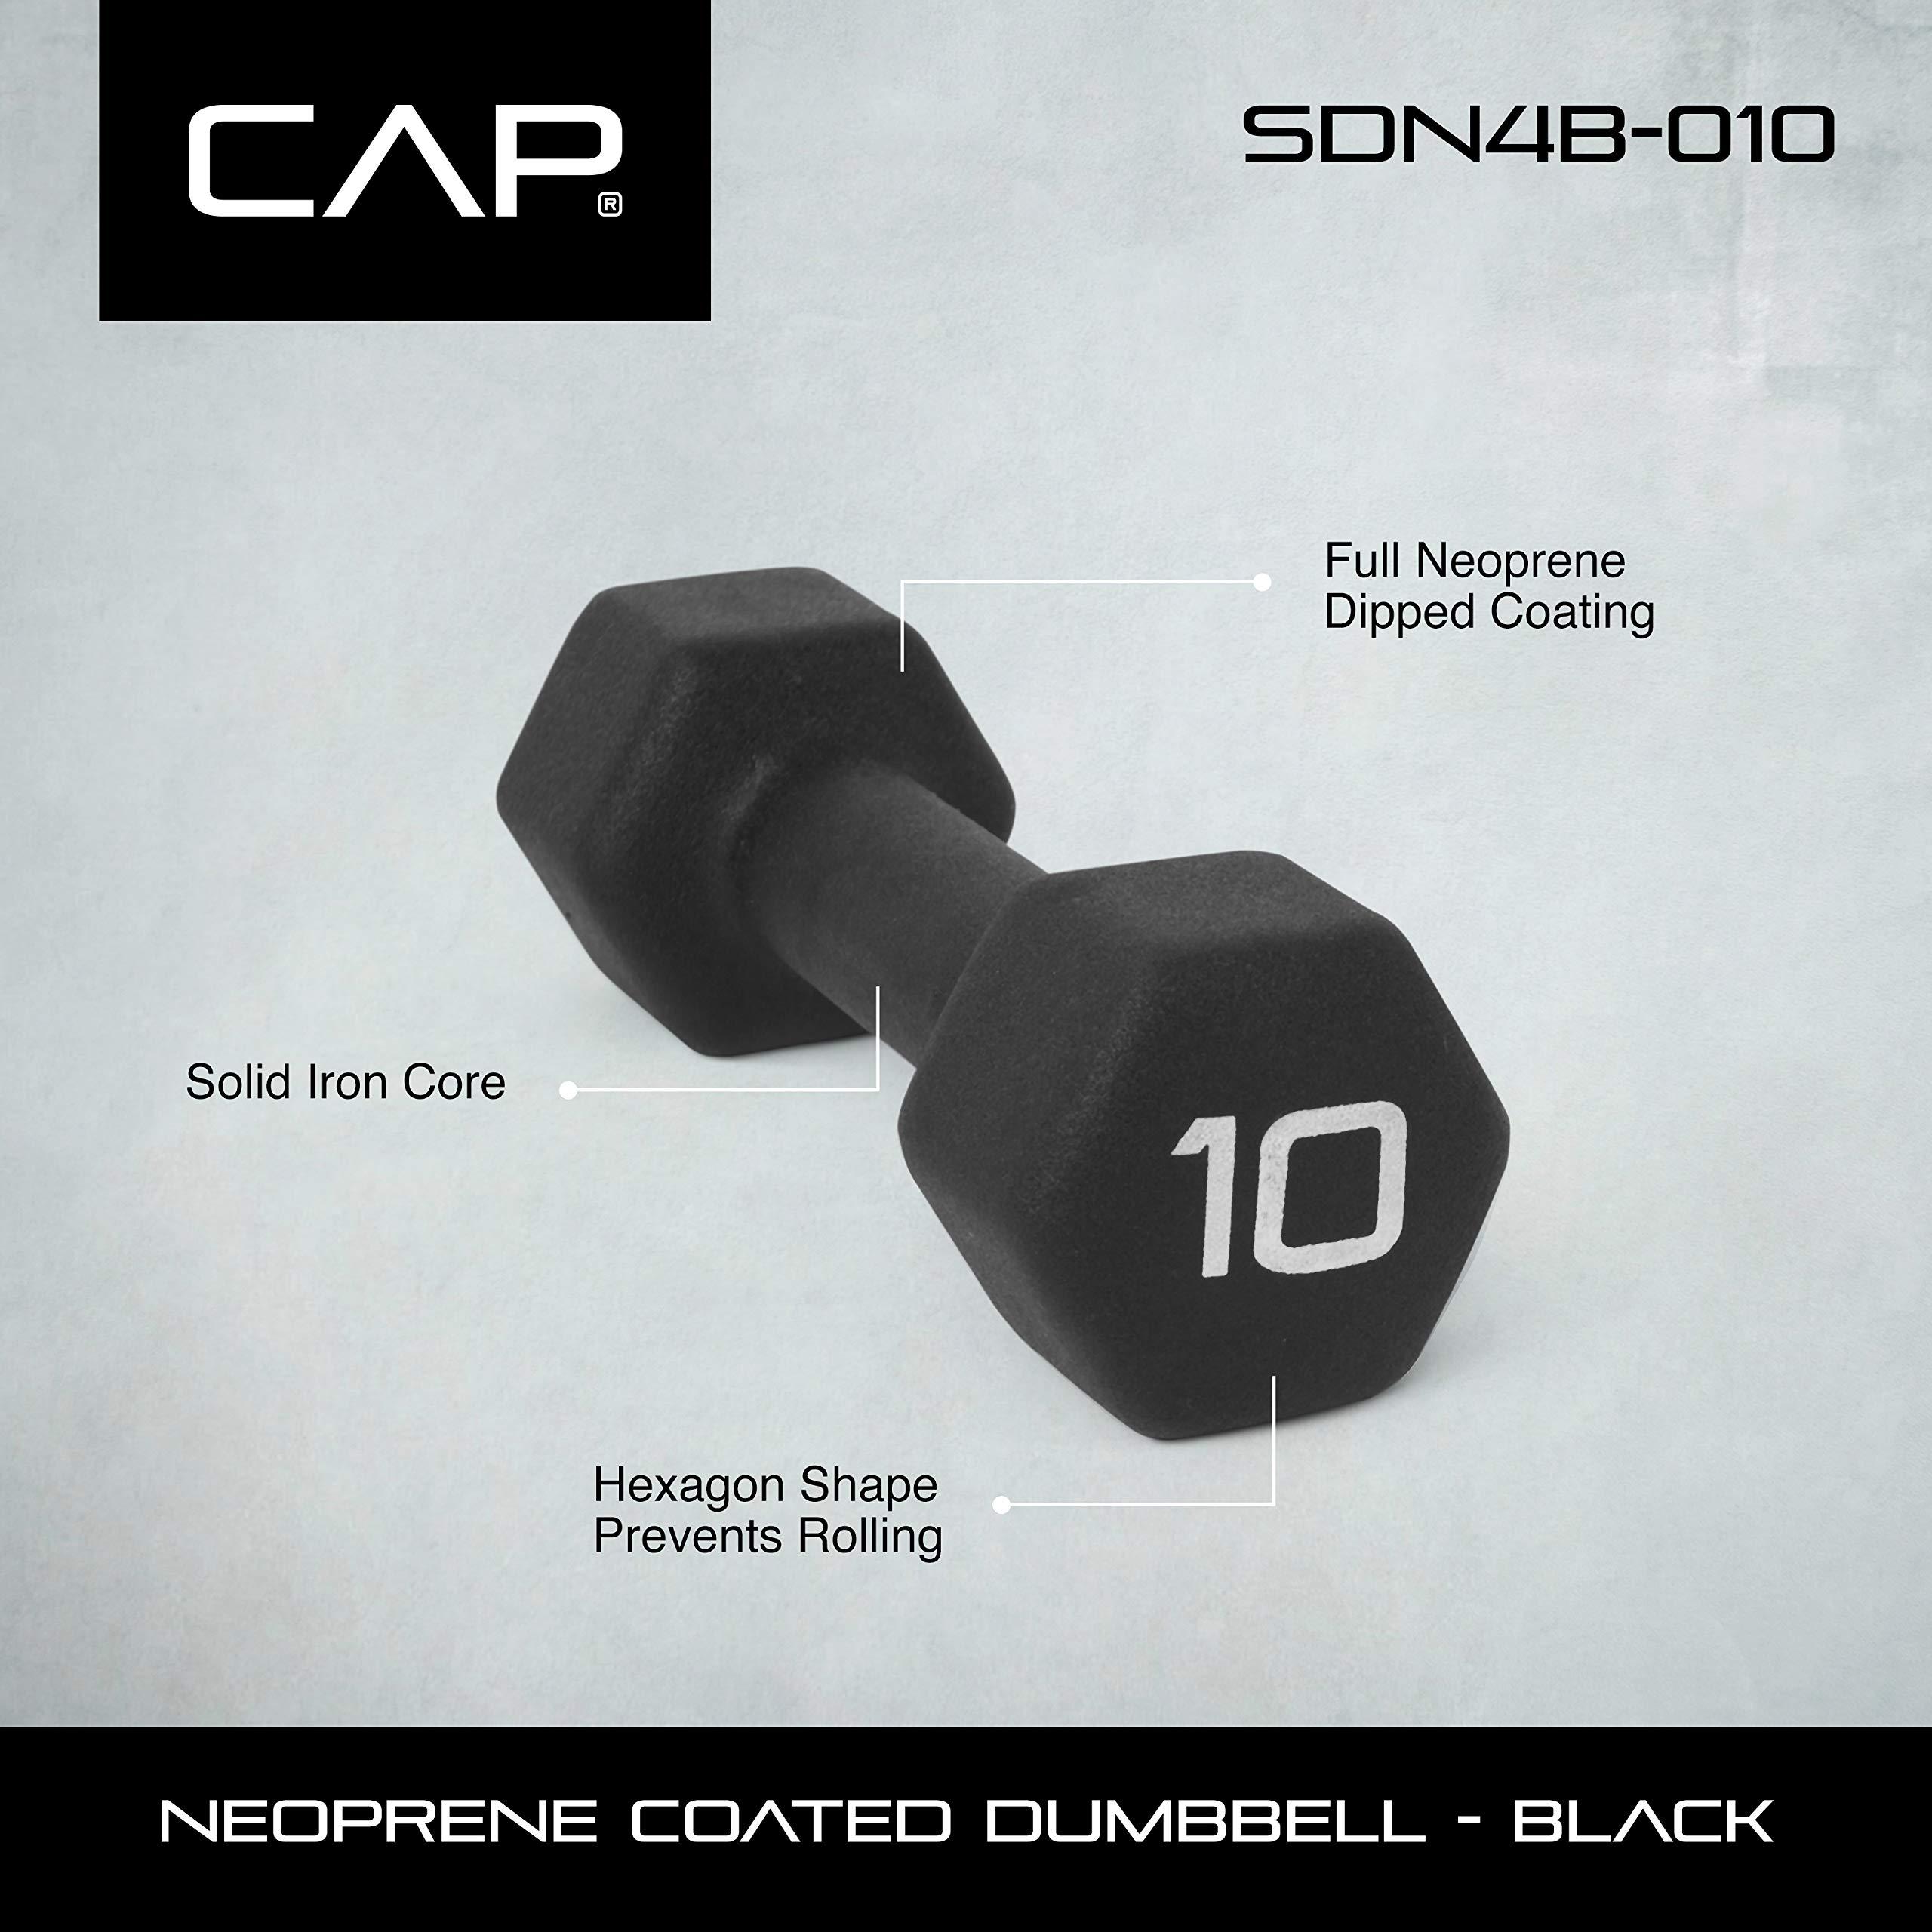 CAP Barbell Neoprene Coated Single Dumbbell, Black, 10-Pound by CAP Barbell (Image #2)